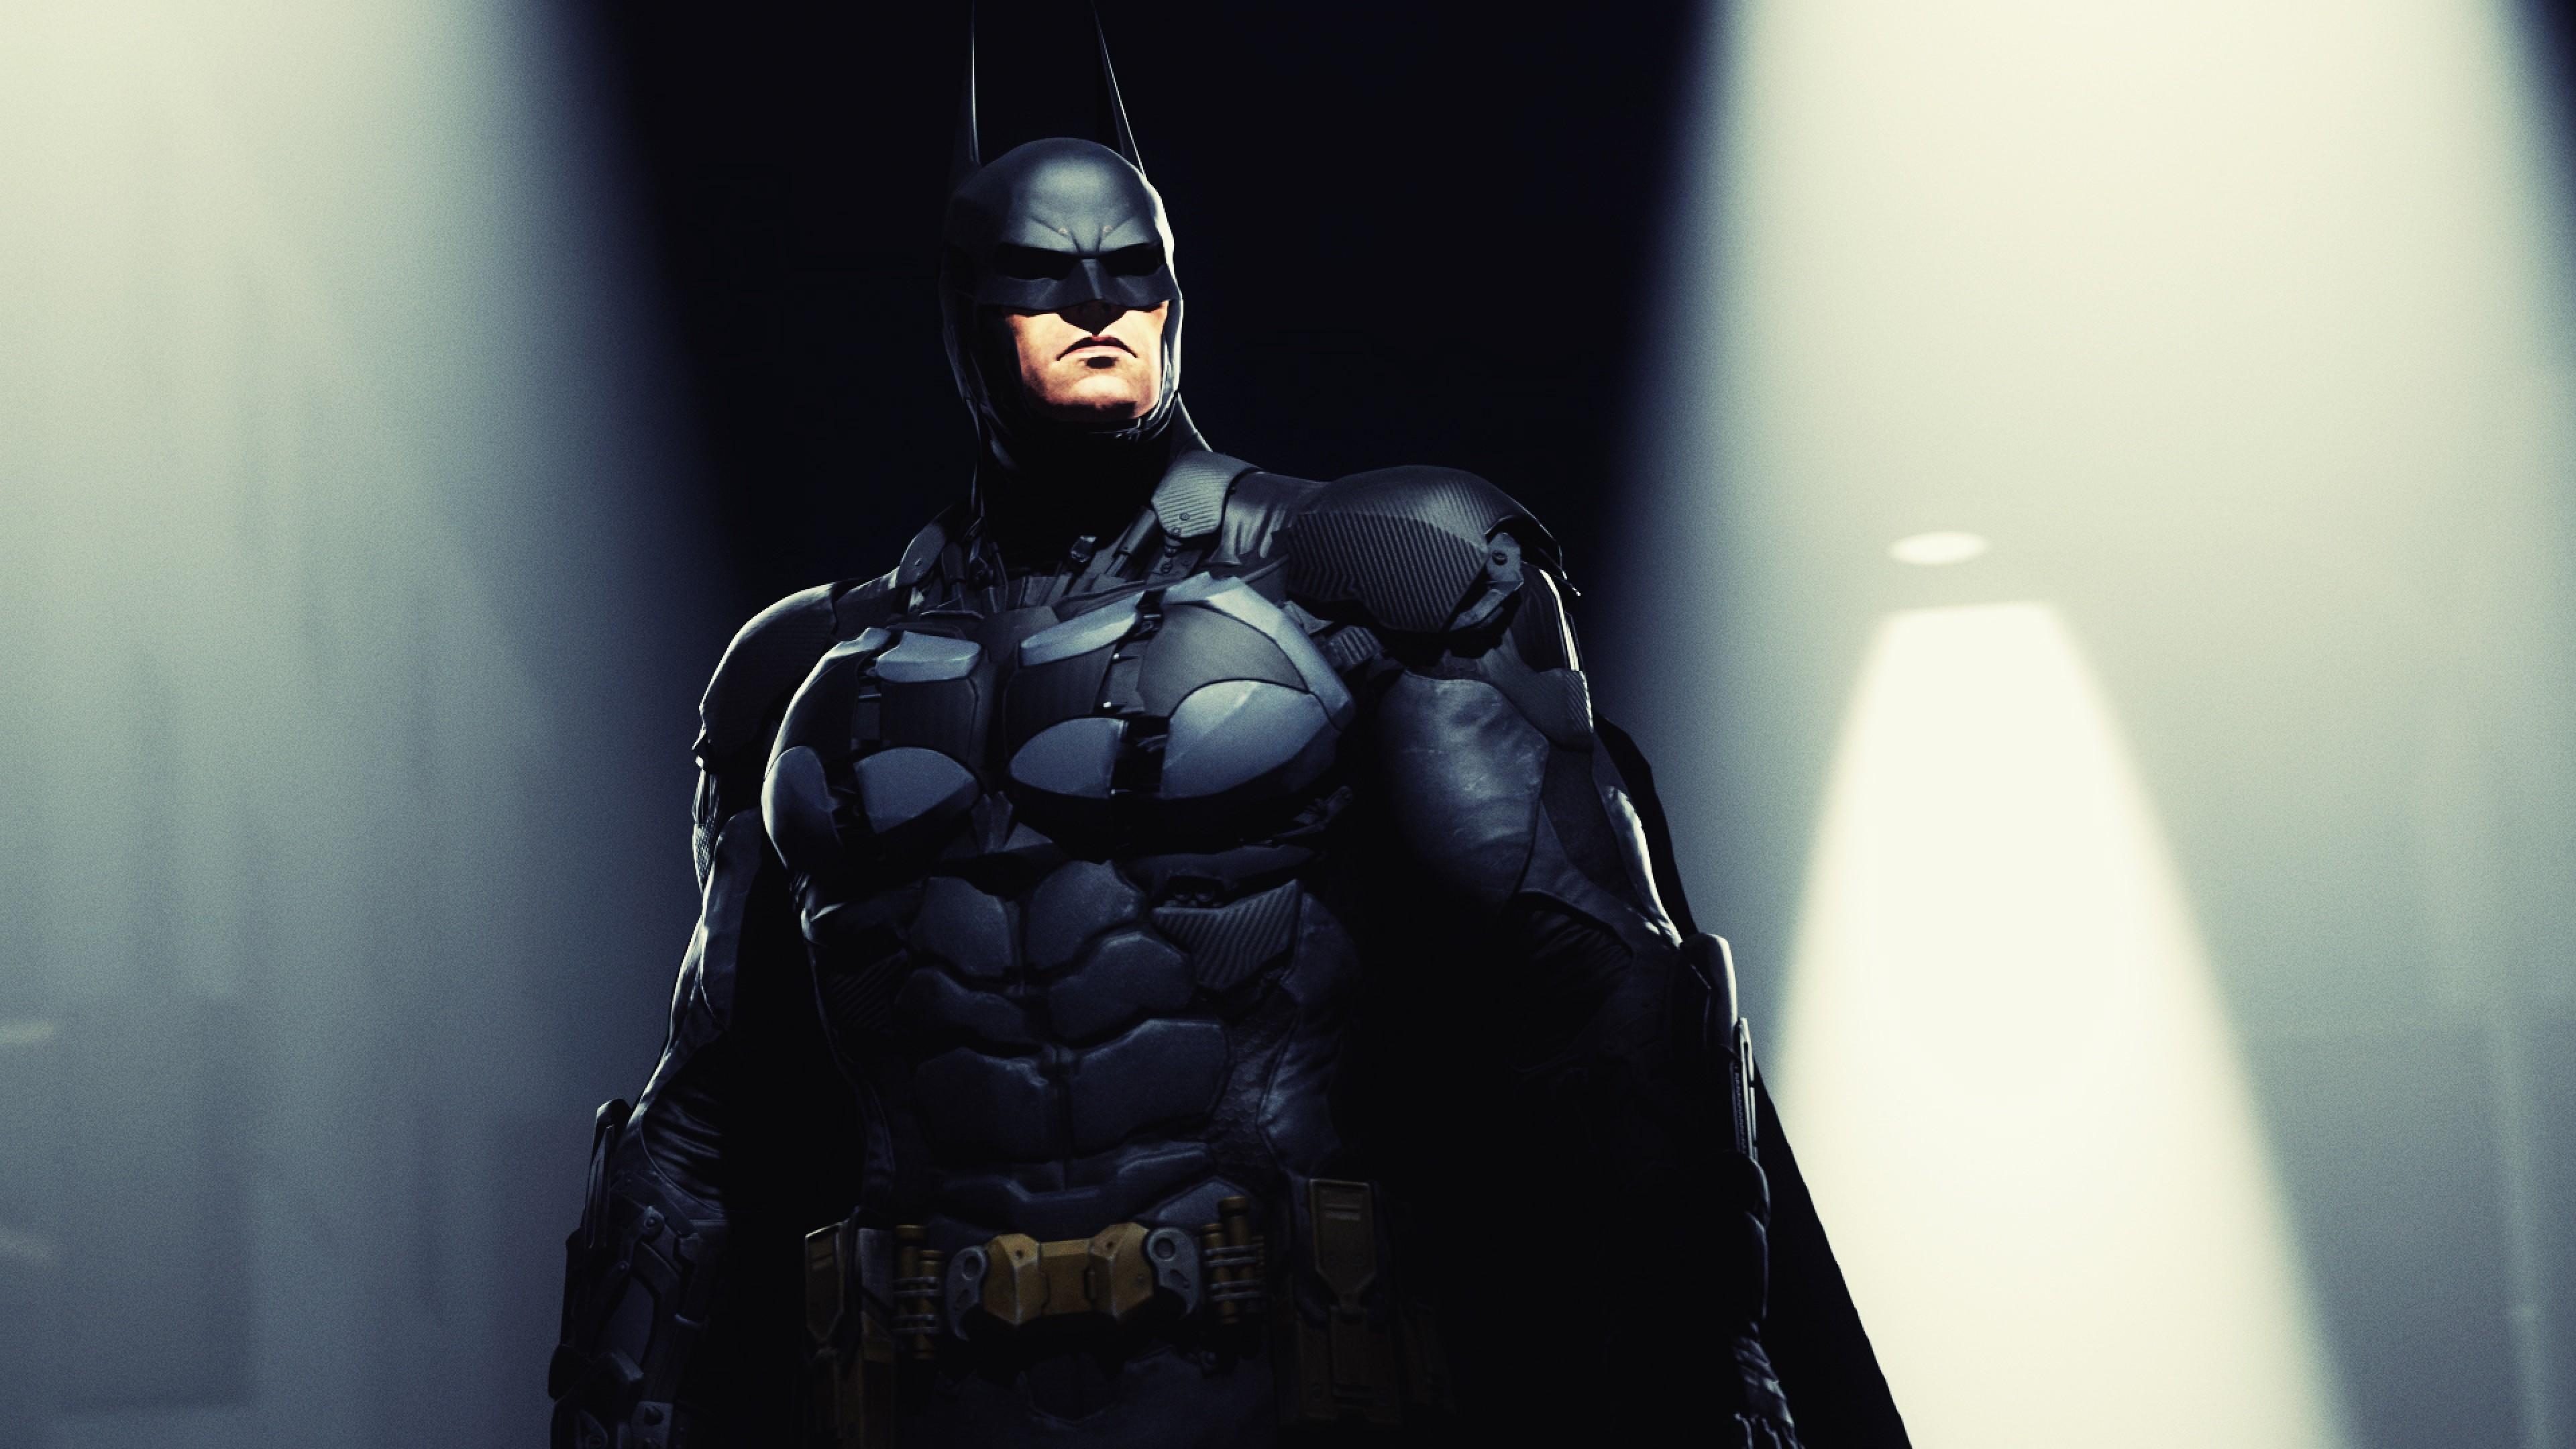 Preview wallpaper batman, arkham knight, rocksteady studios, bruce wayne,  dc comics 3840×2160